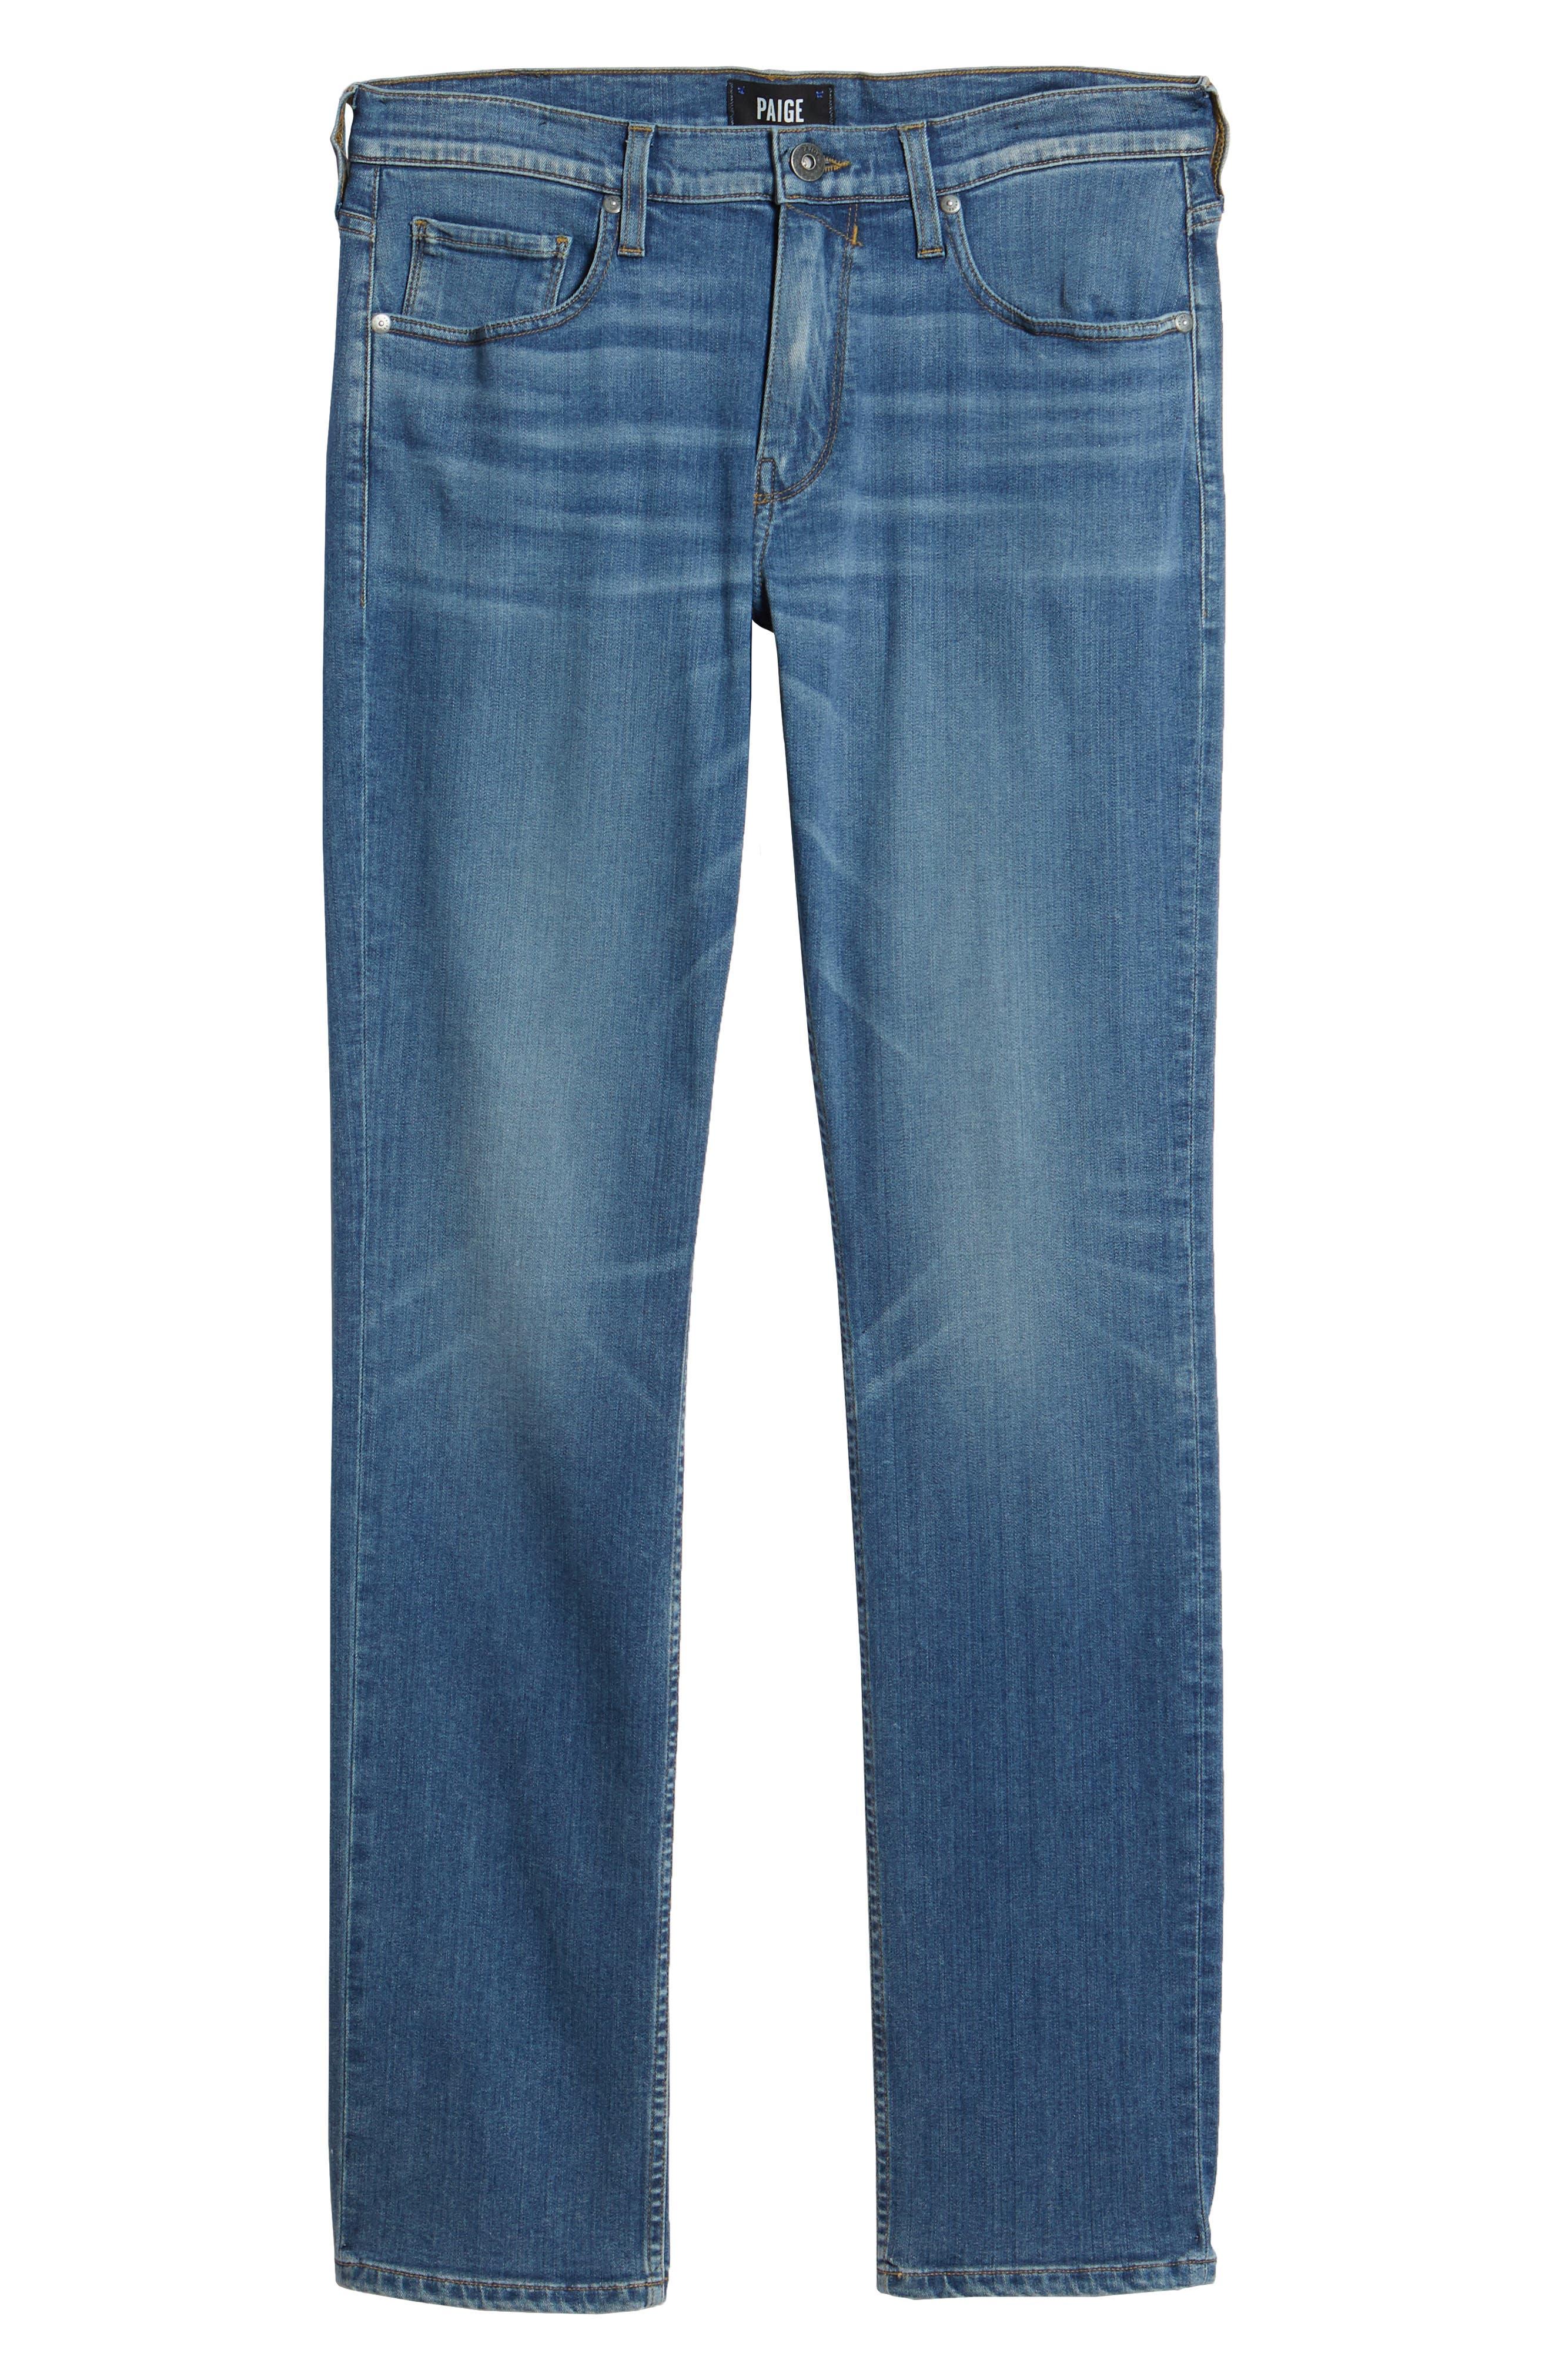 Transcend - Federal Slim Straight Leg Jeans,                             Alternate thumbnail 6, color,                             Caine